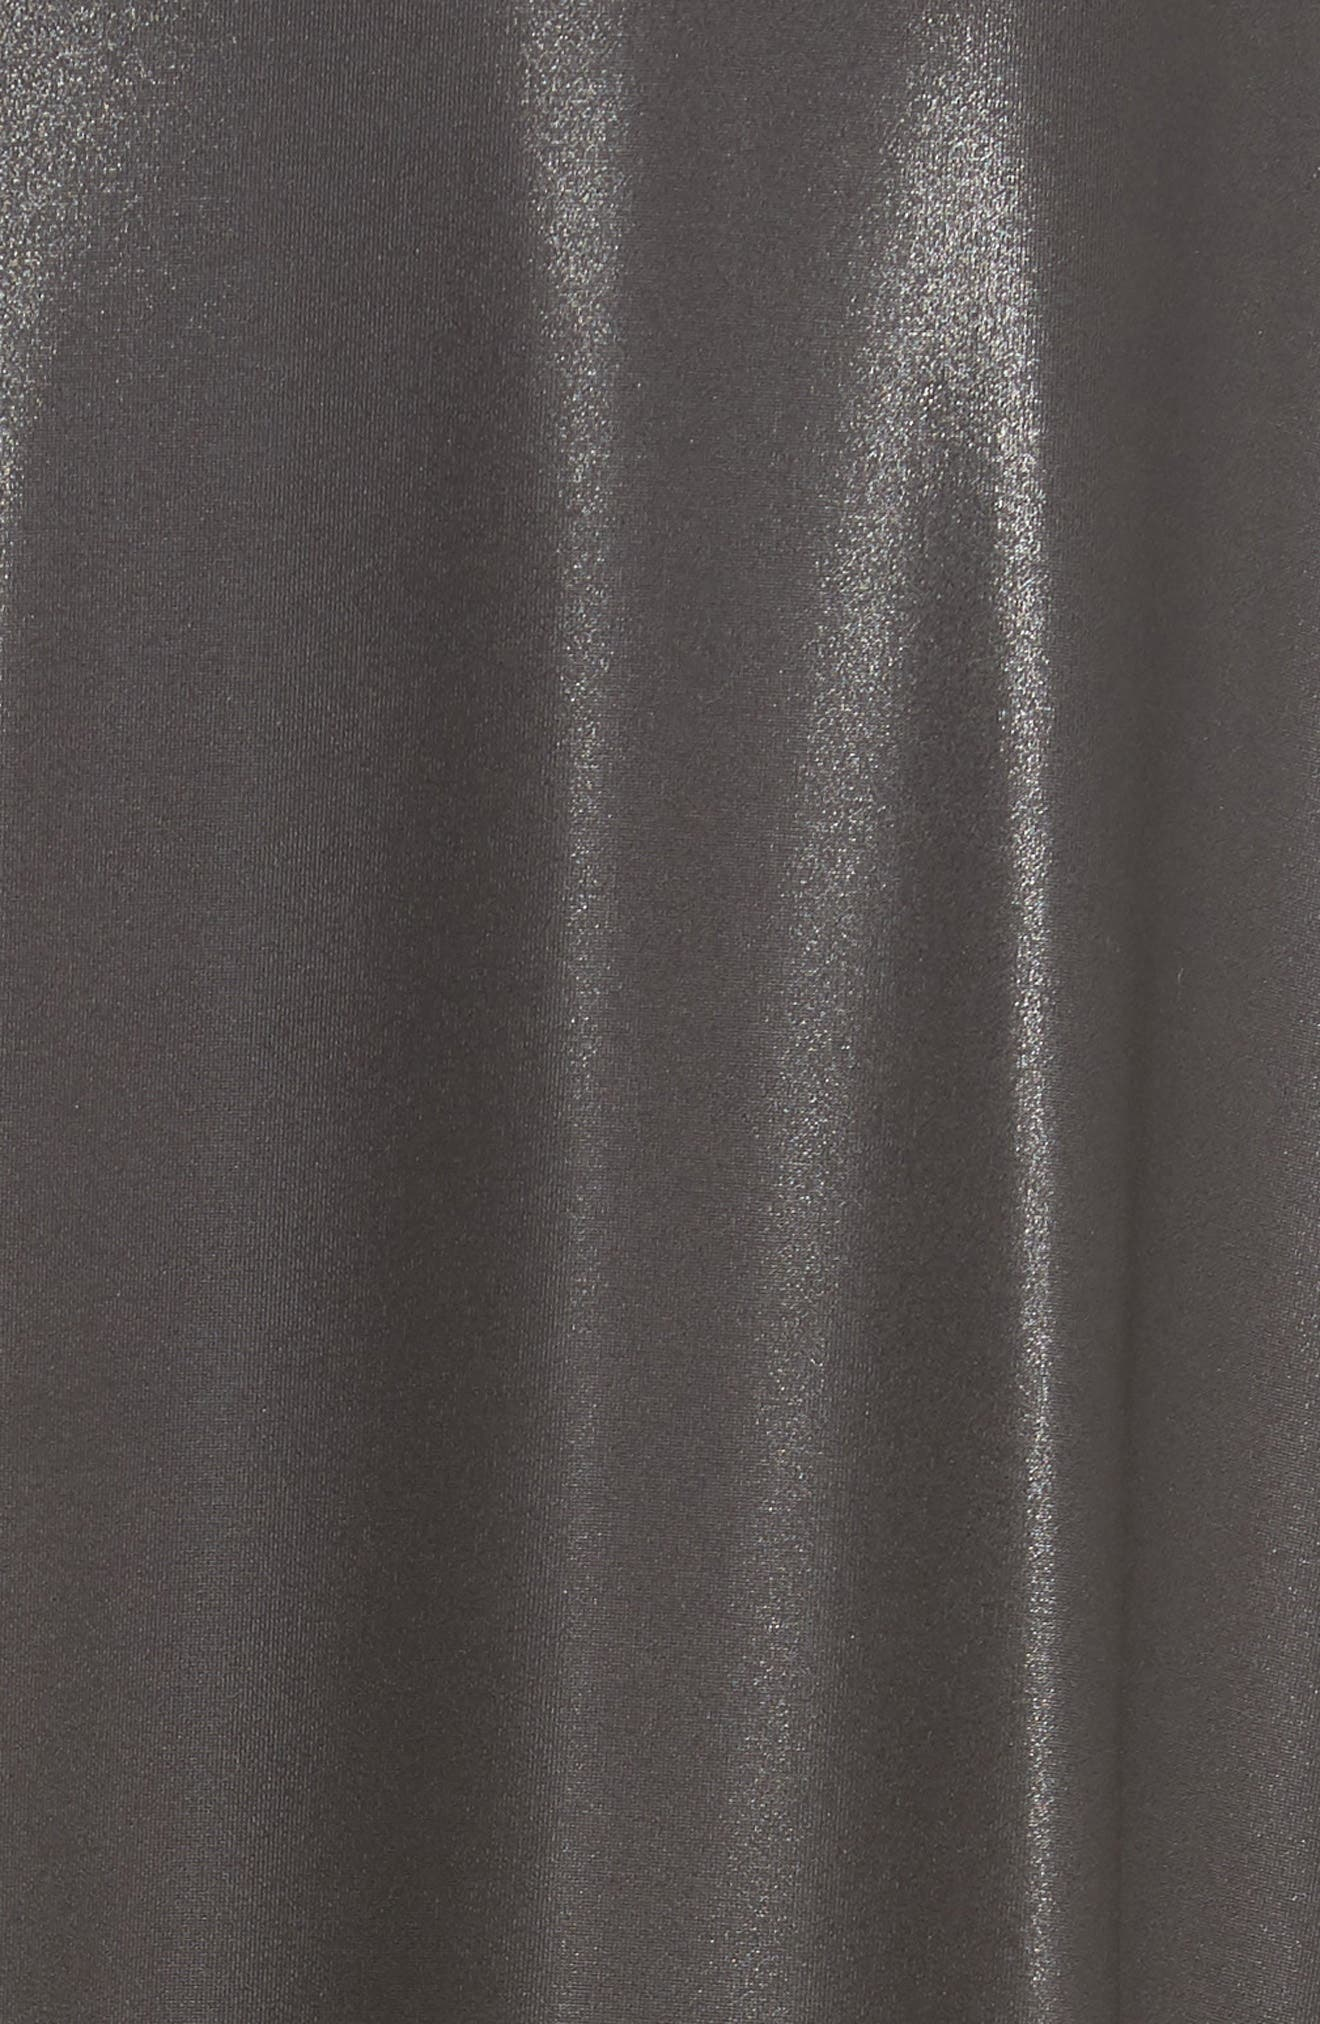 Coated Turtleneck Dress,                             Alternate thumbnail 5, color,                             BLACK